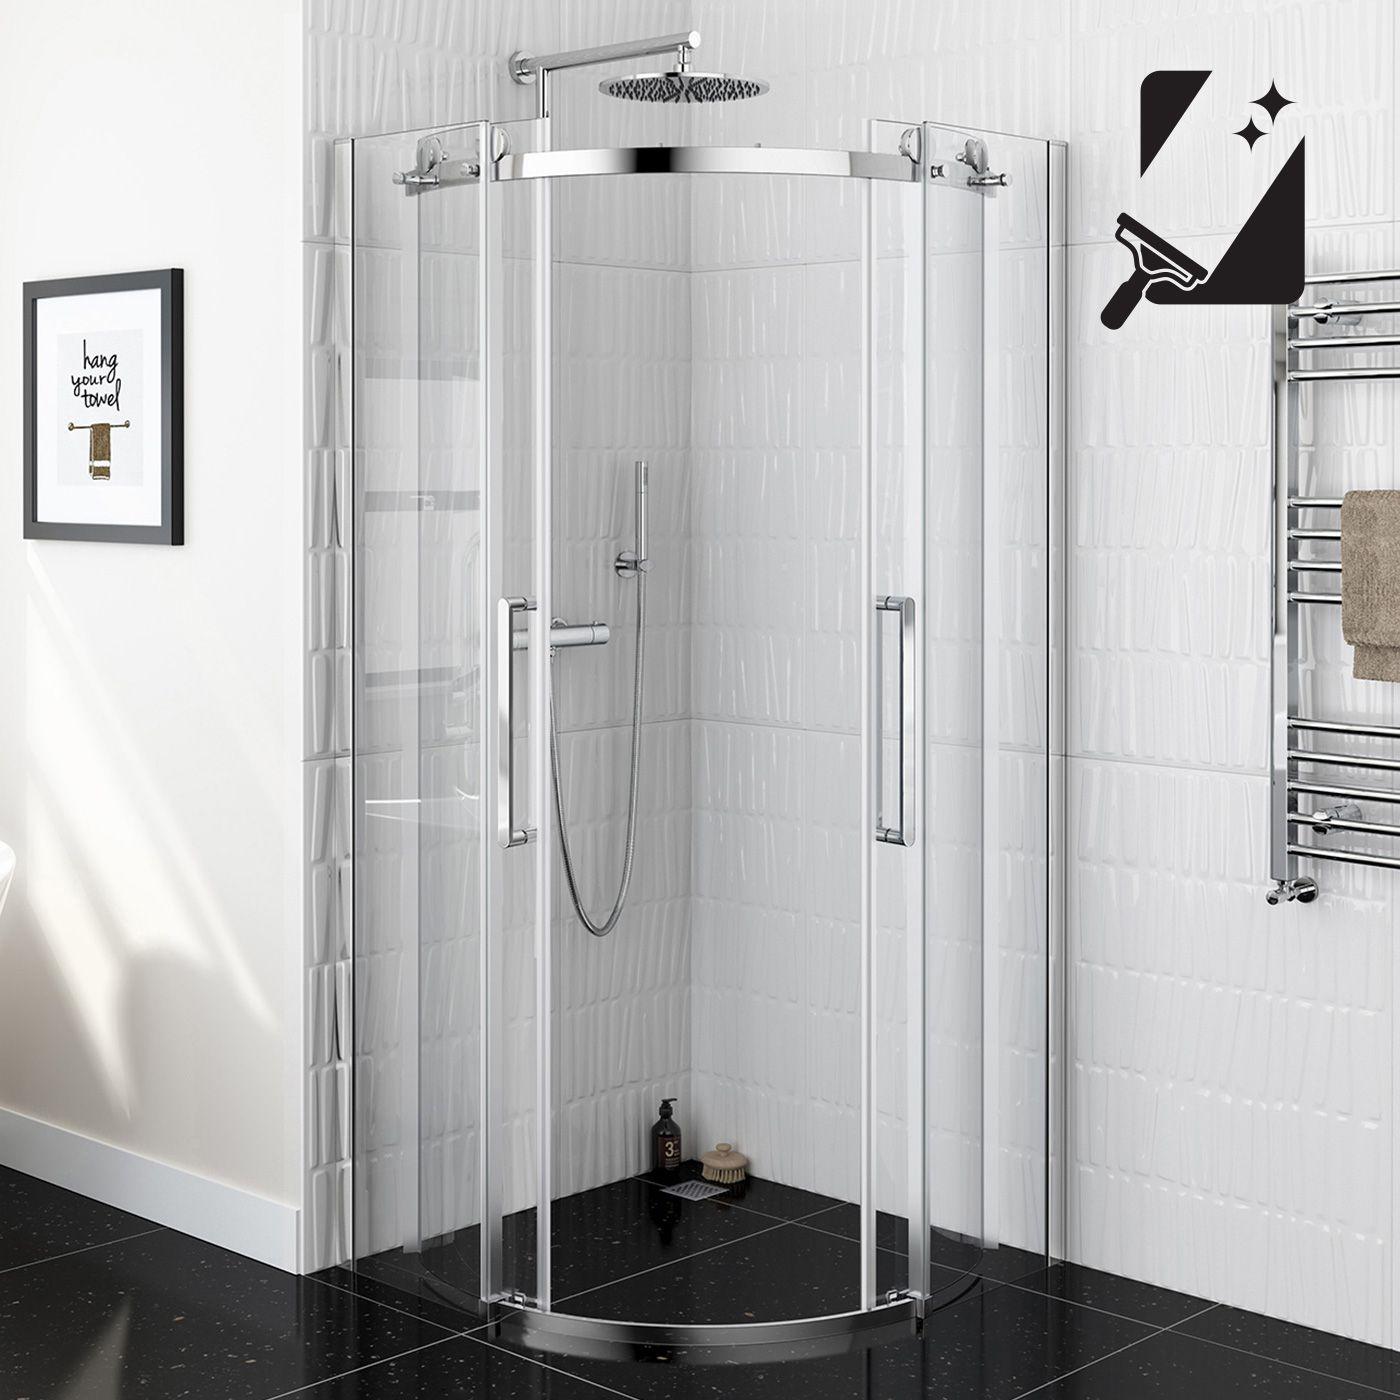 900mmx900mm Designer Frameless Easyclean Quadrant Shower Enclosure 8mm Soak Com Quadrant Shower Corner Shower Units Quadrant Shower Enclosures